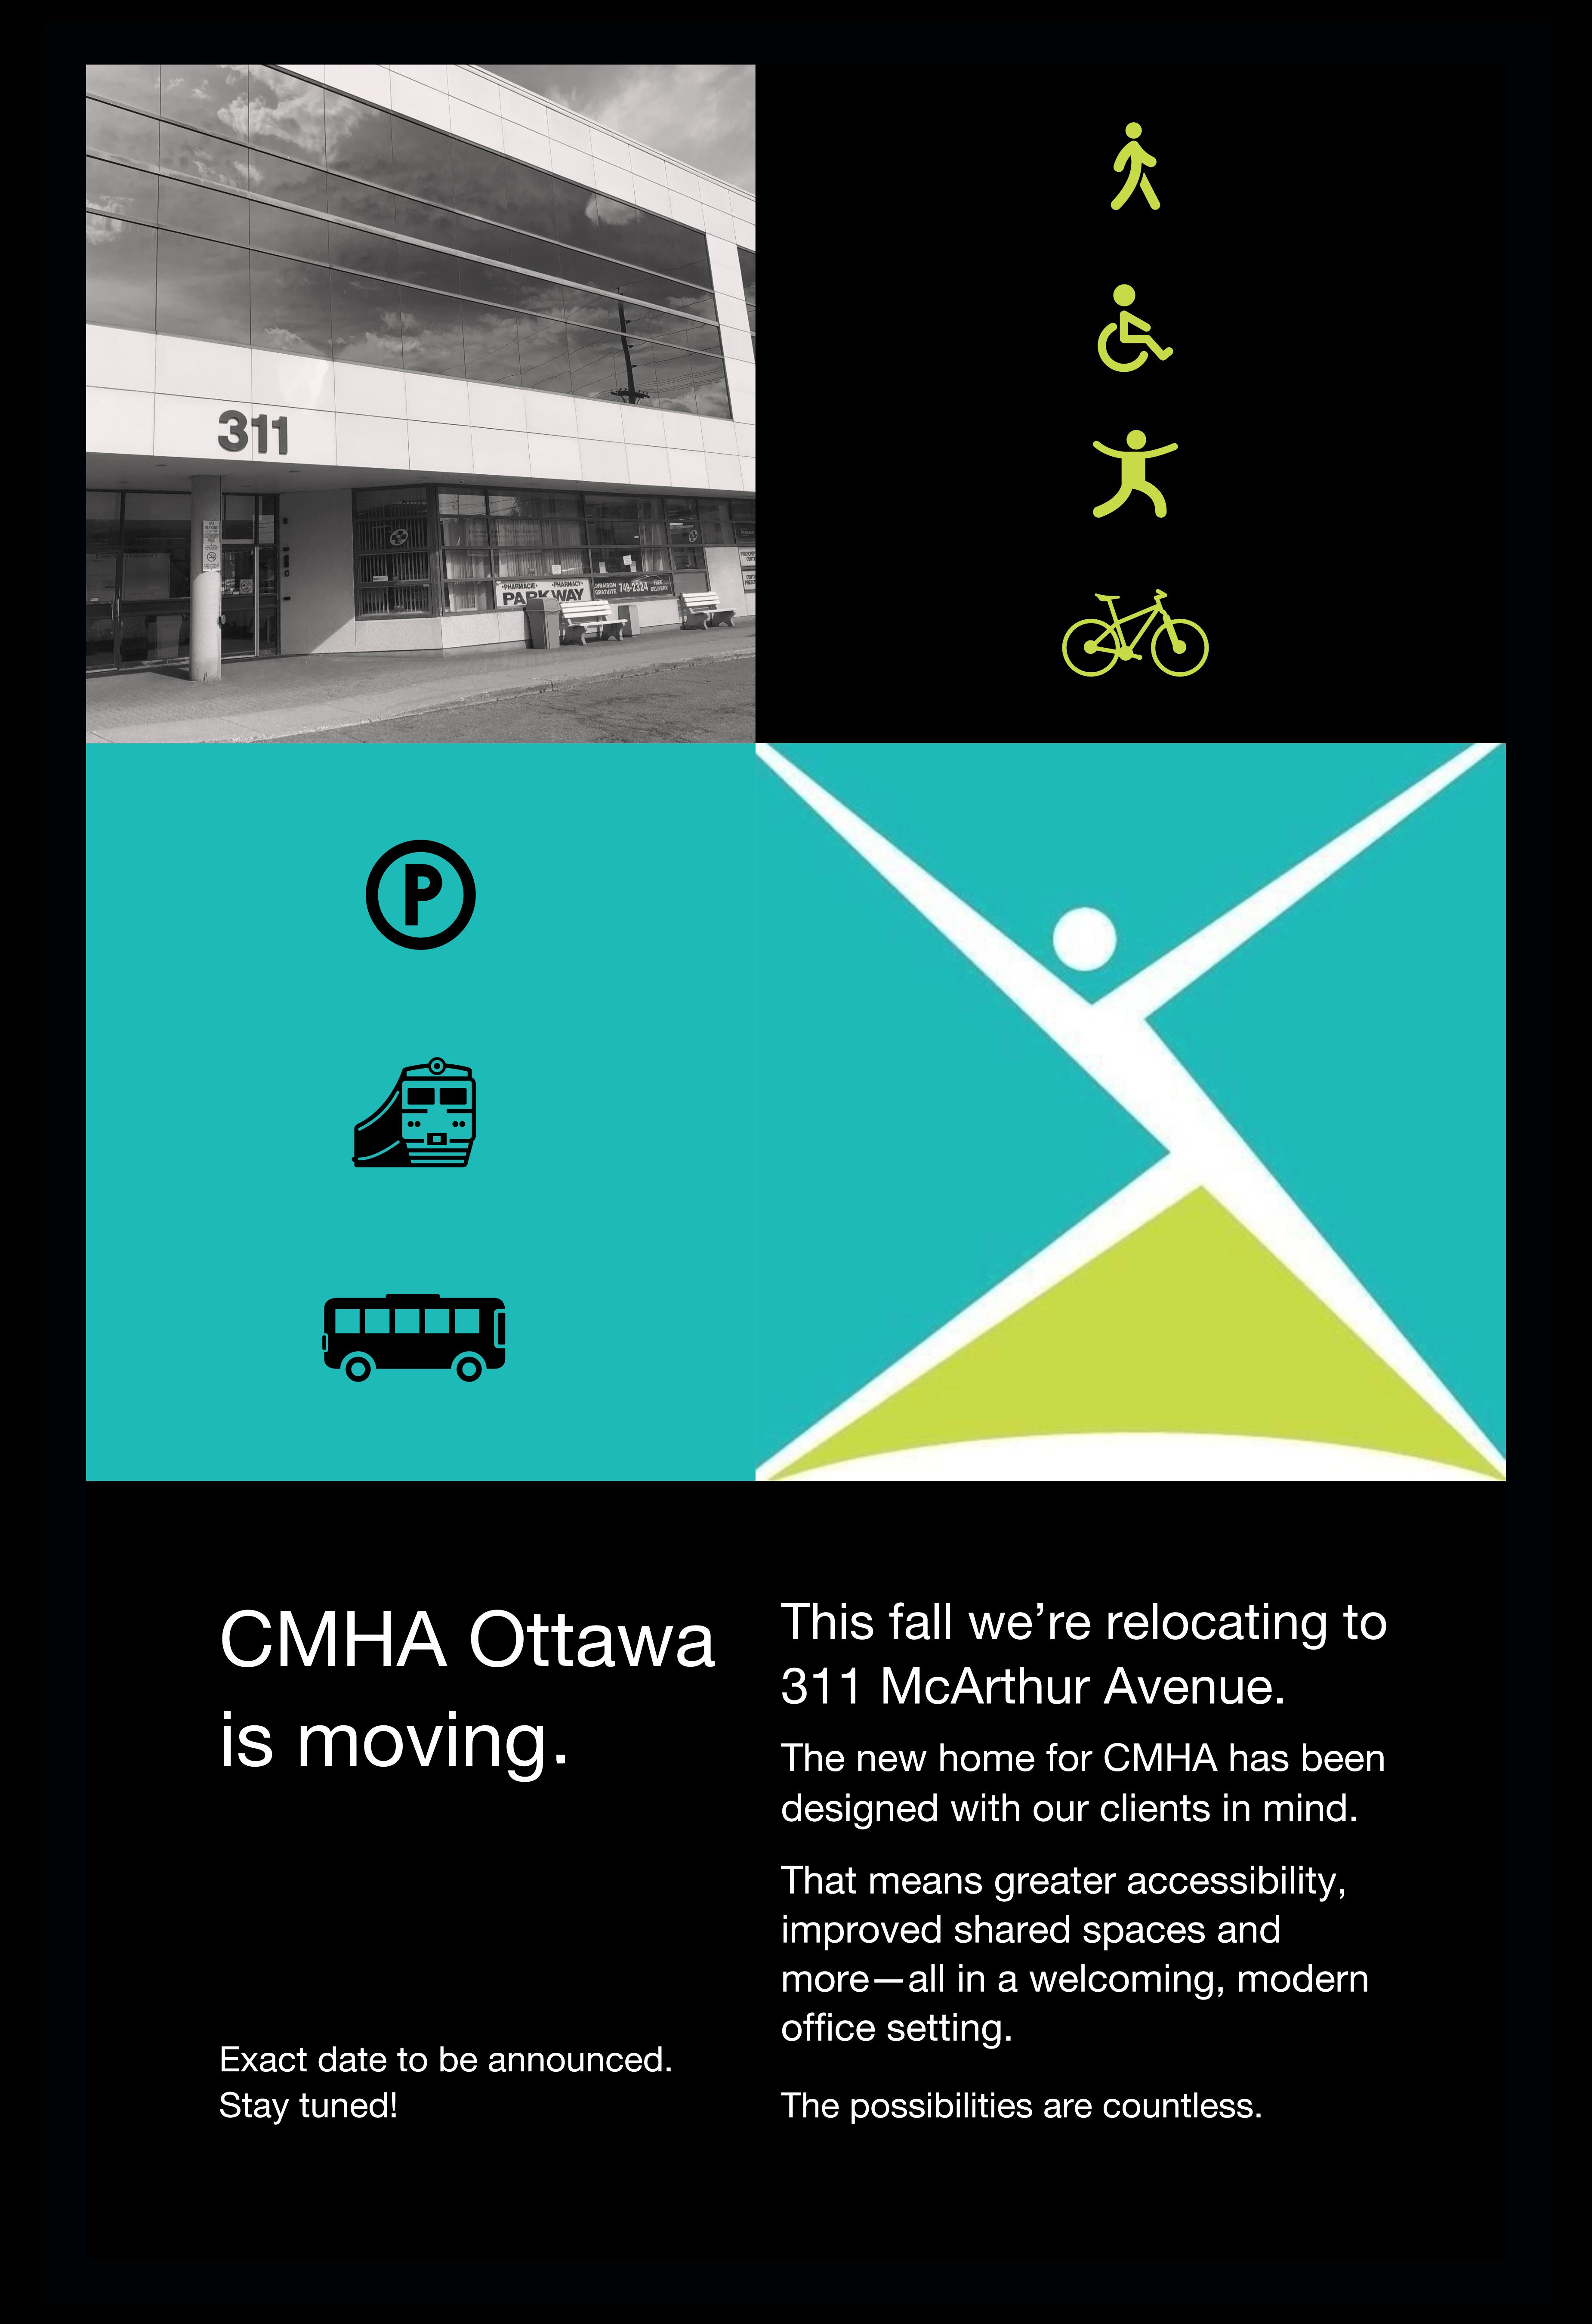 CMHA Ottawa is moving